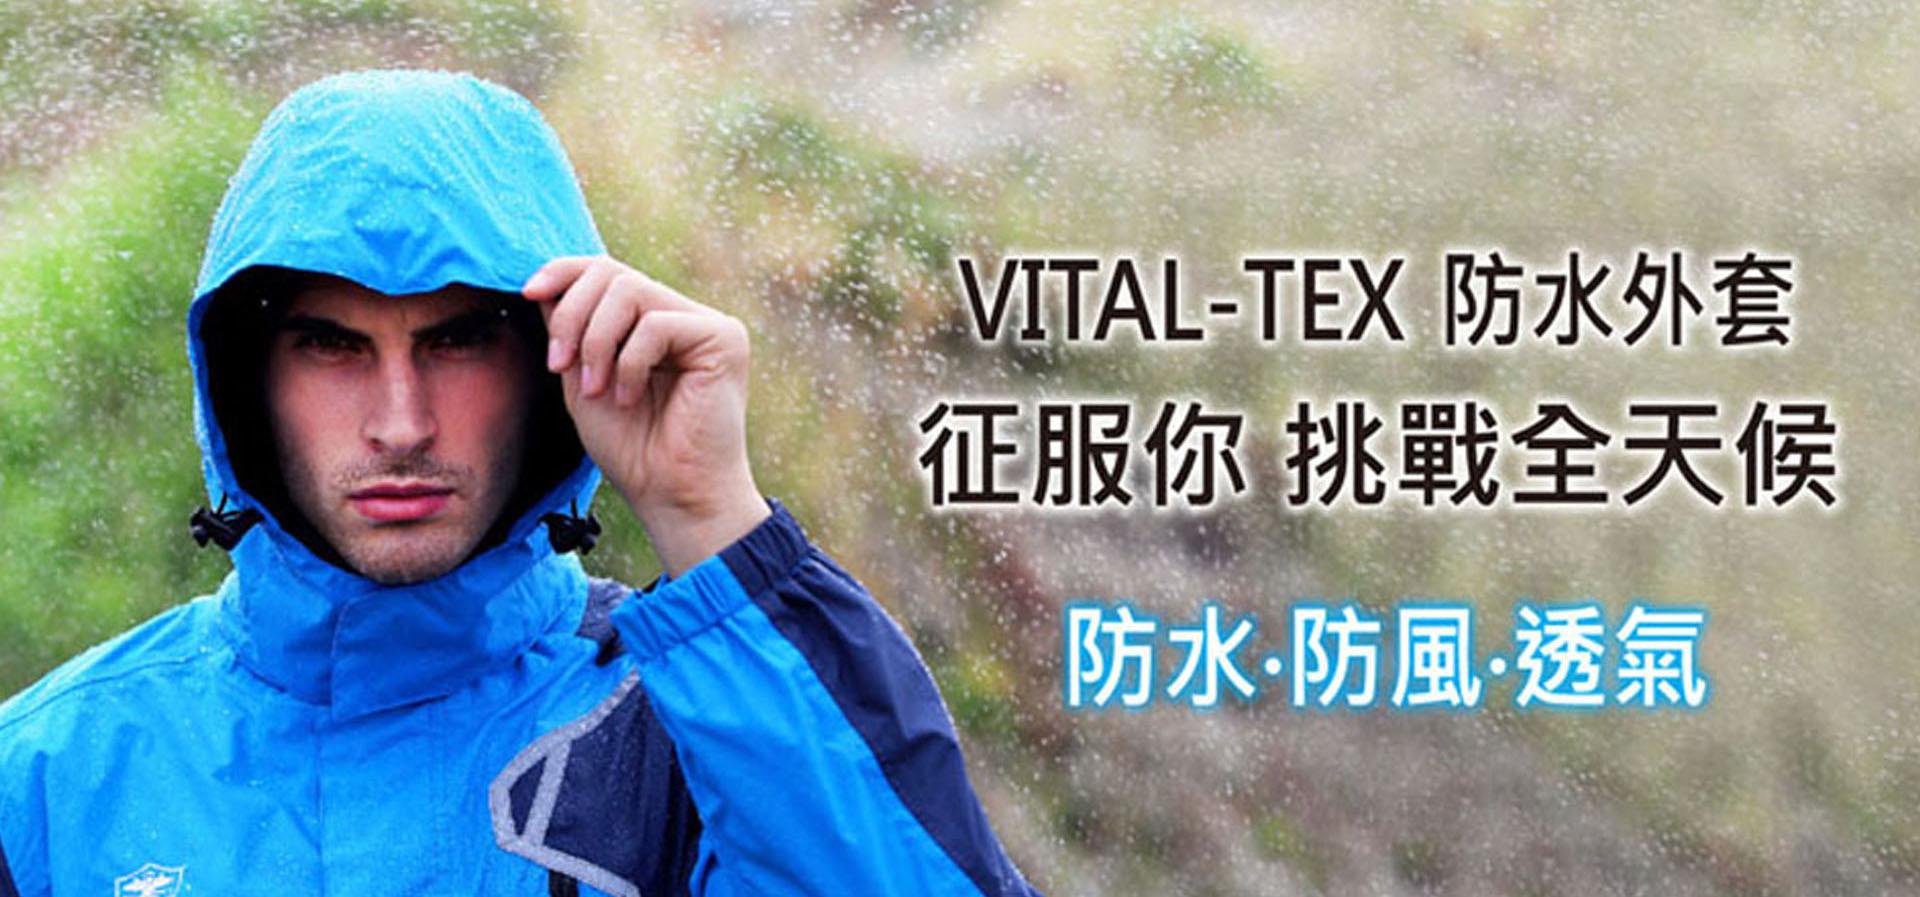 VITAL-TEX 防水外套 防水 防風 透氣